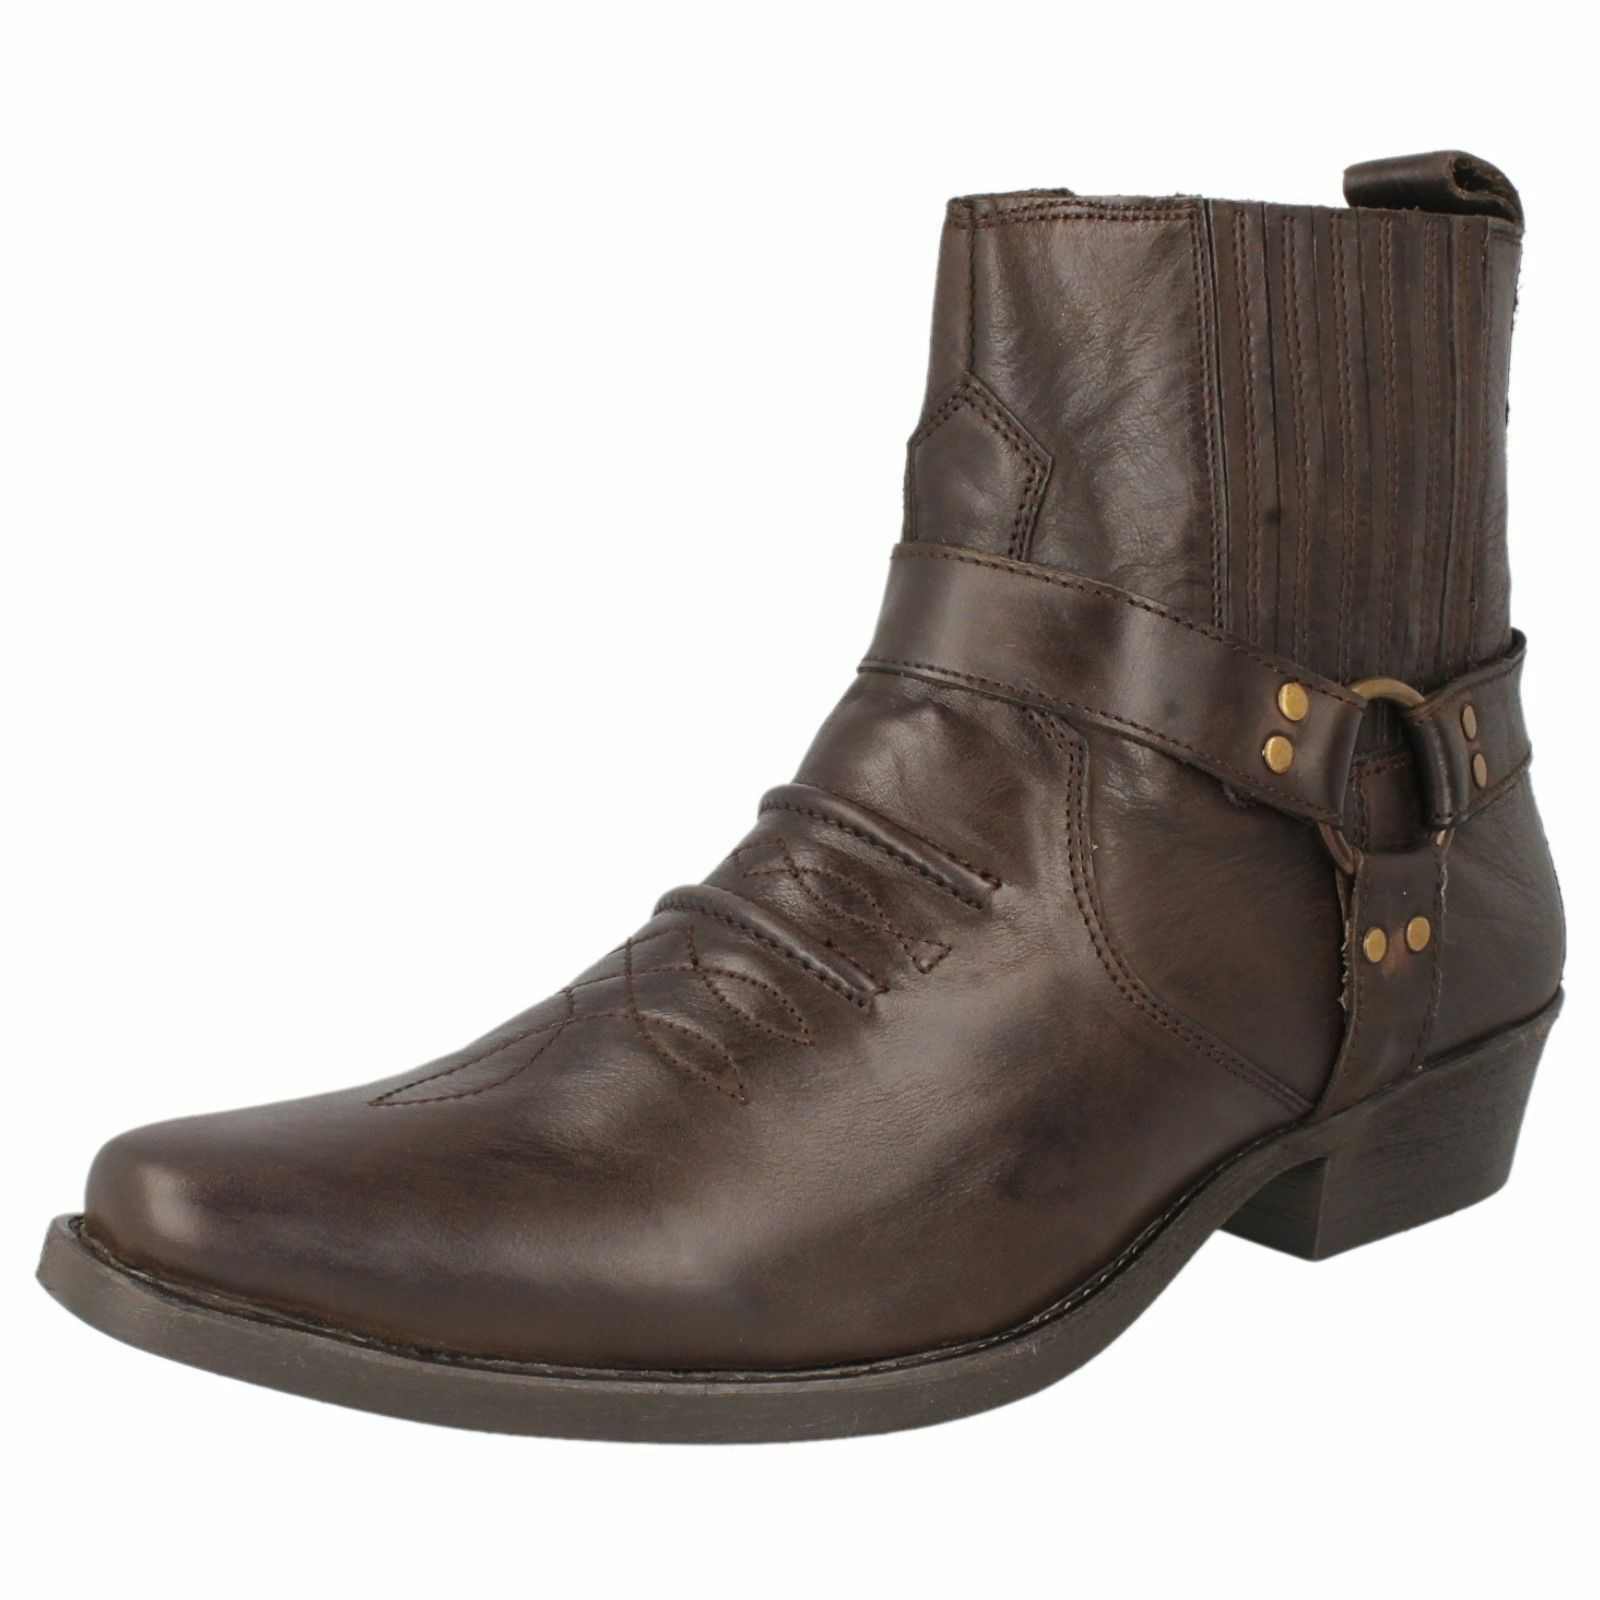 Maverick A3R003 Herren Hellbraunes Leder Mode Stiefel UK Zum Reinschlüpfen UK Stiefel 8 X 526b0f